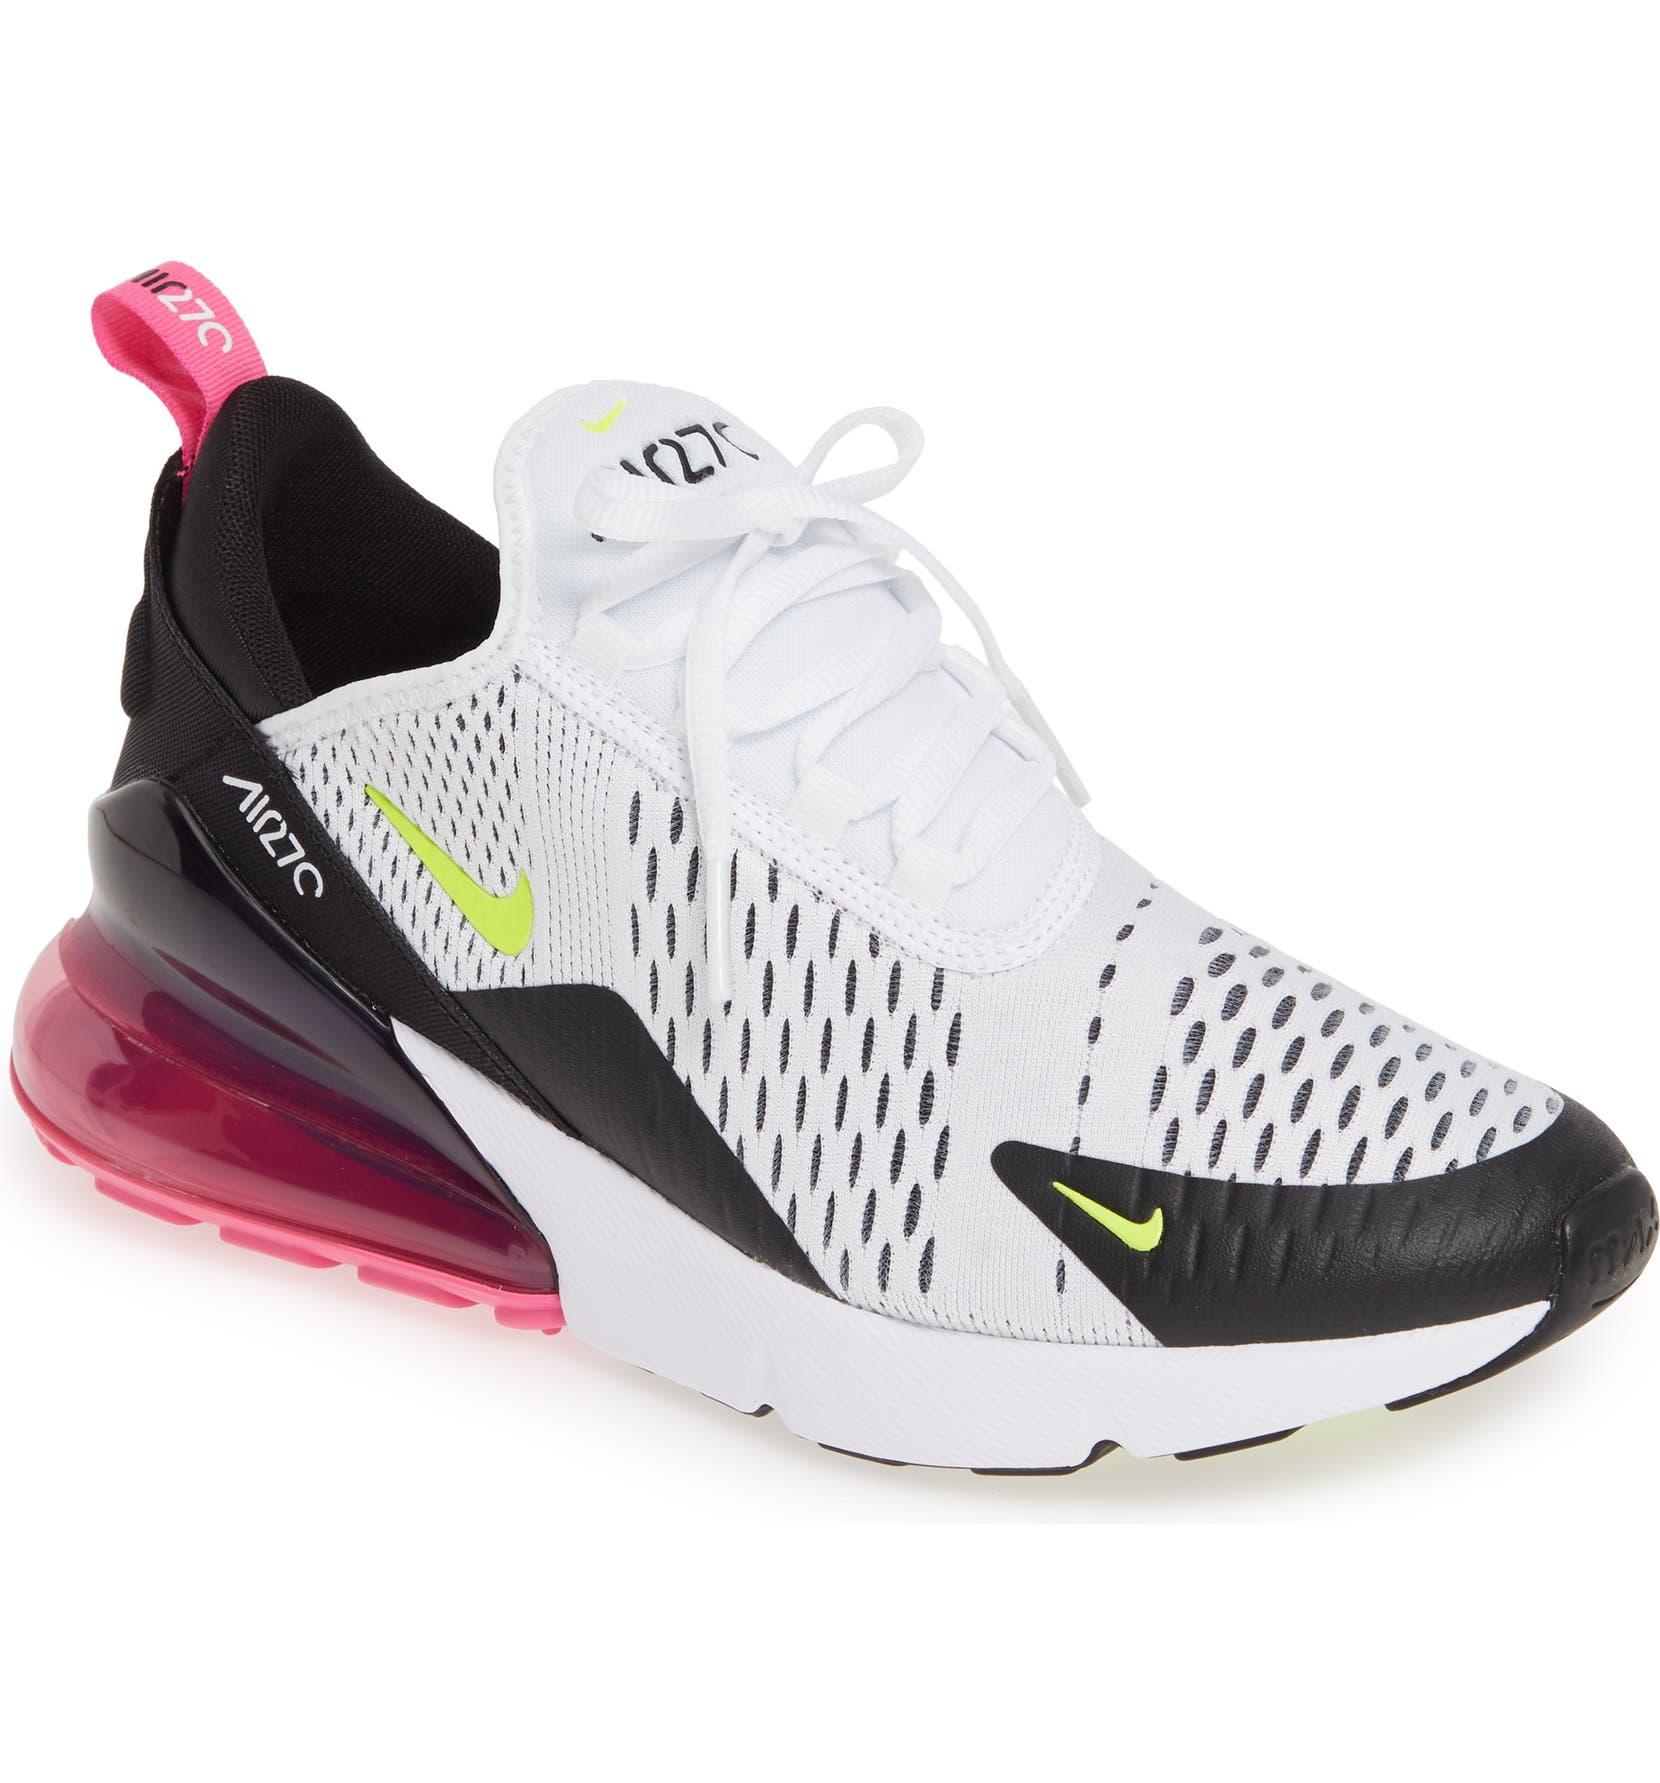 info for 848ef 27be6 Nike Air Max 270 Sneaker (Toddler, Little Kid   Big Kid)   Nordstrom